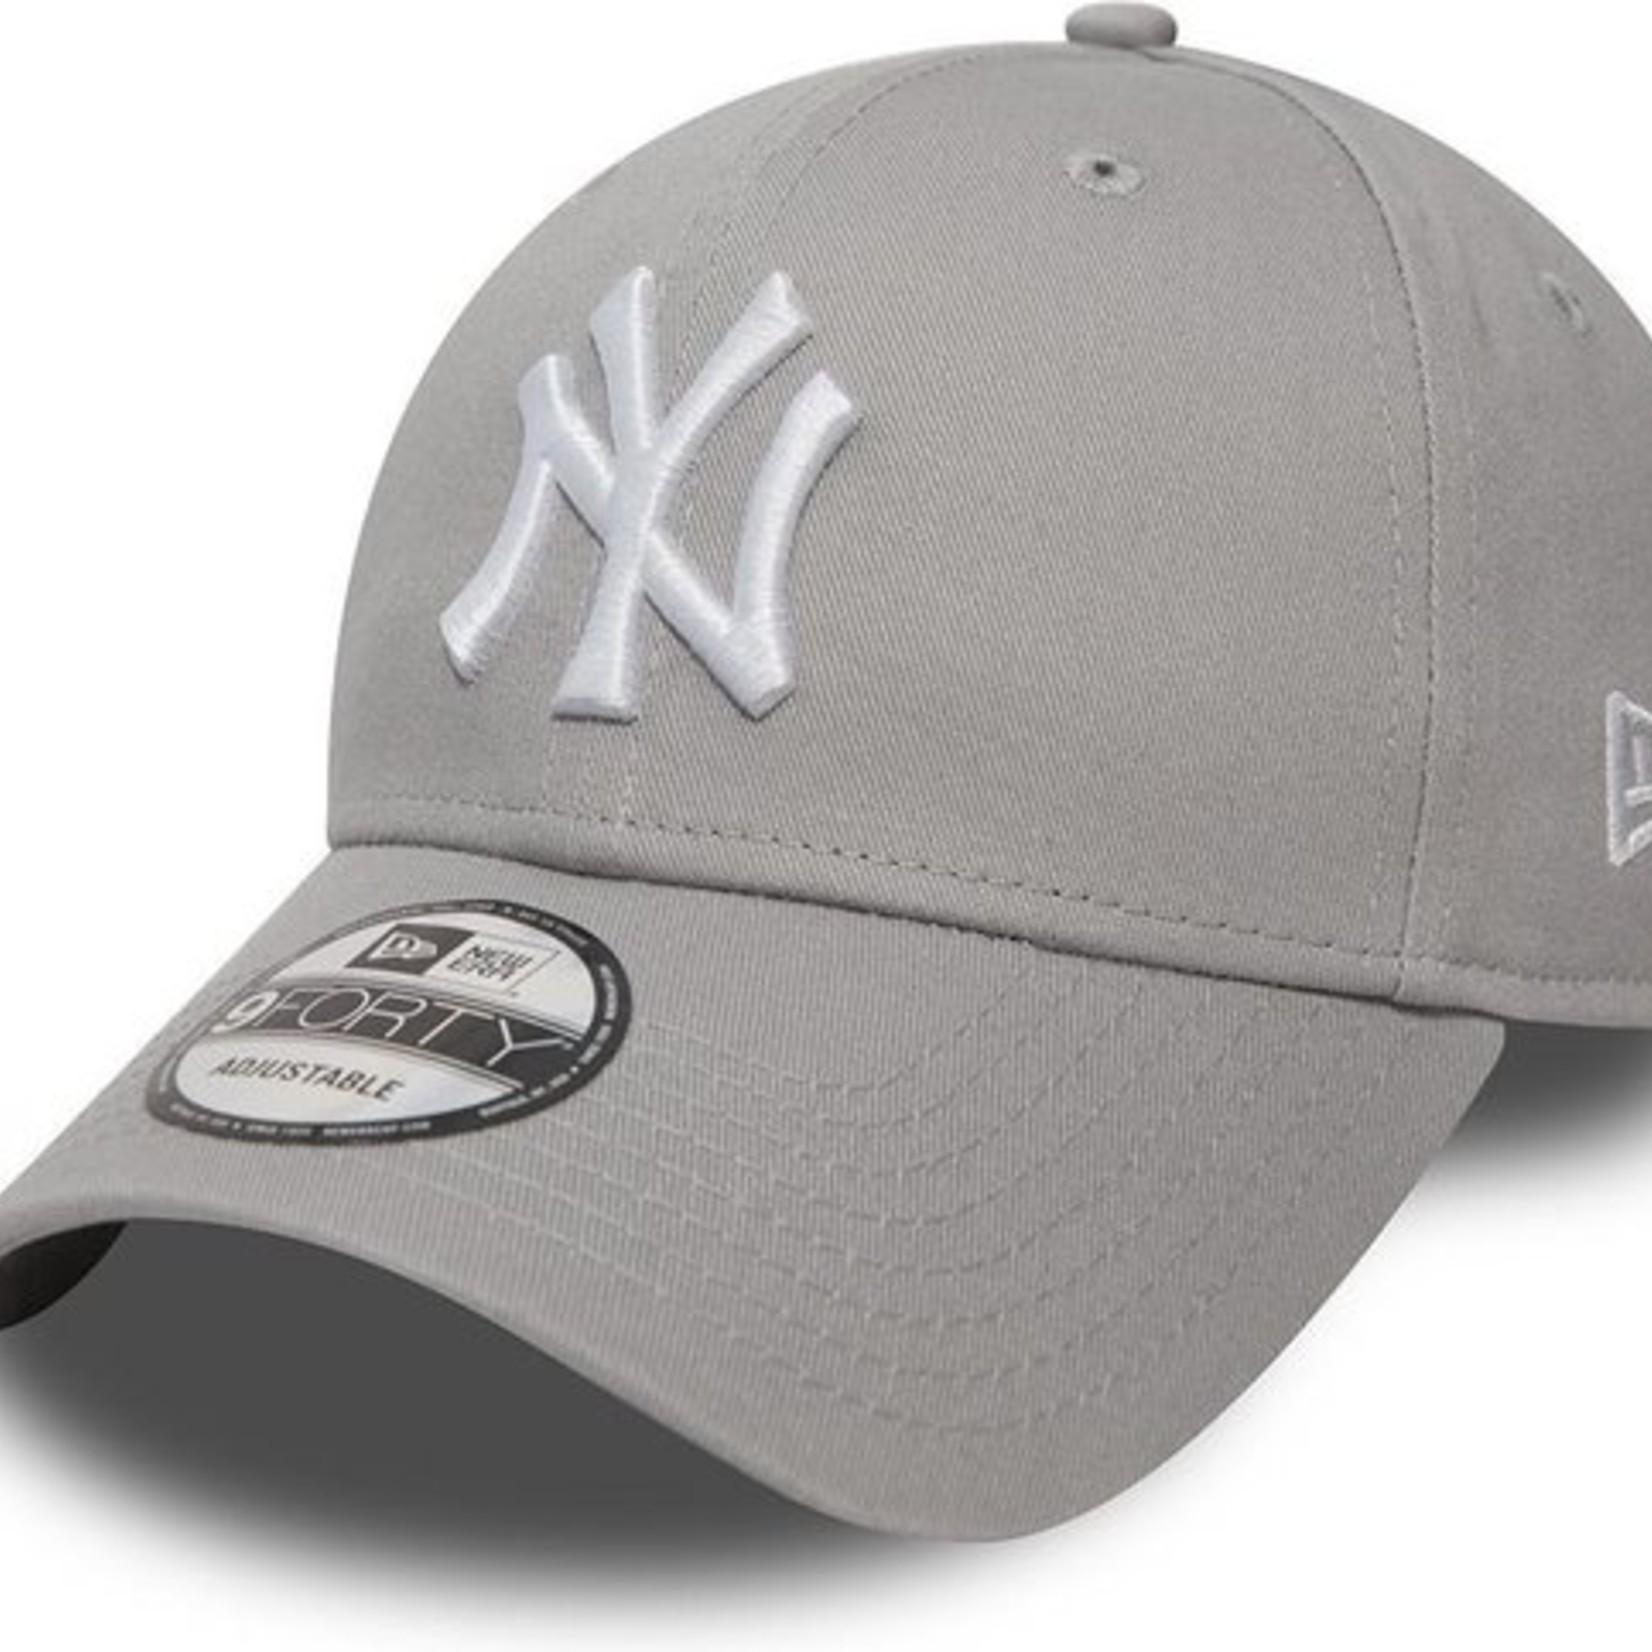 New Era NY 9Forty Grey/White adjustable